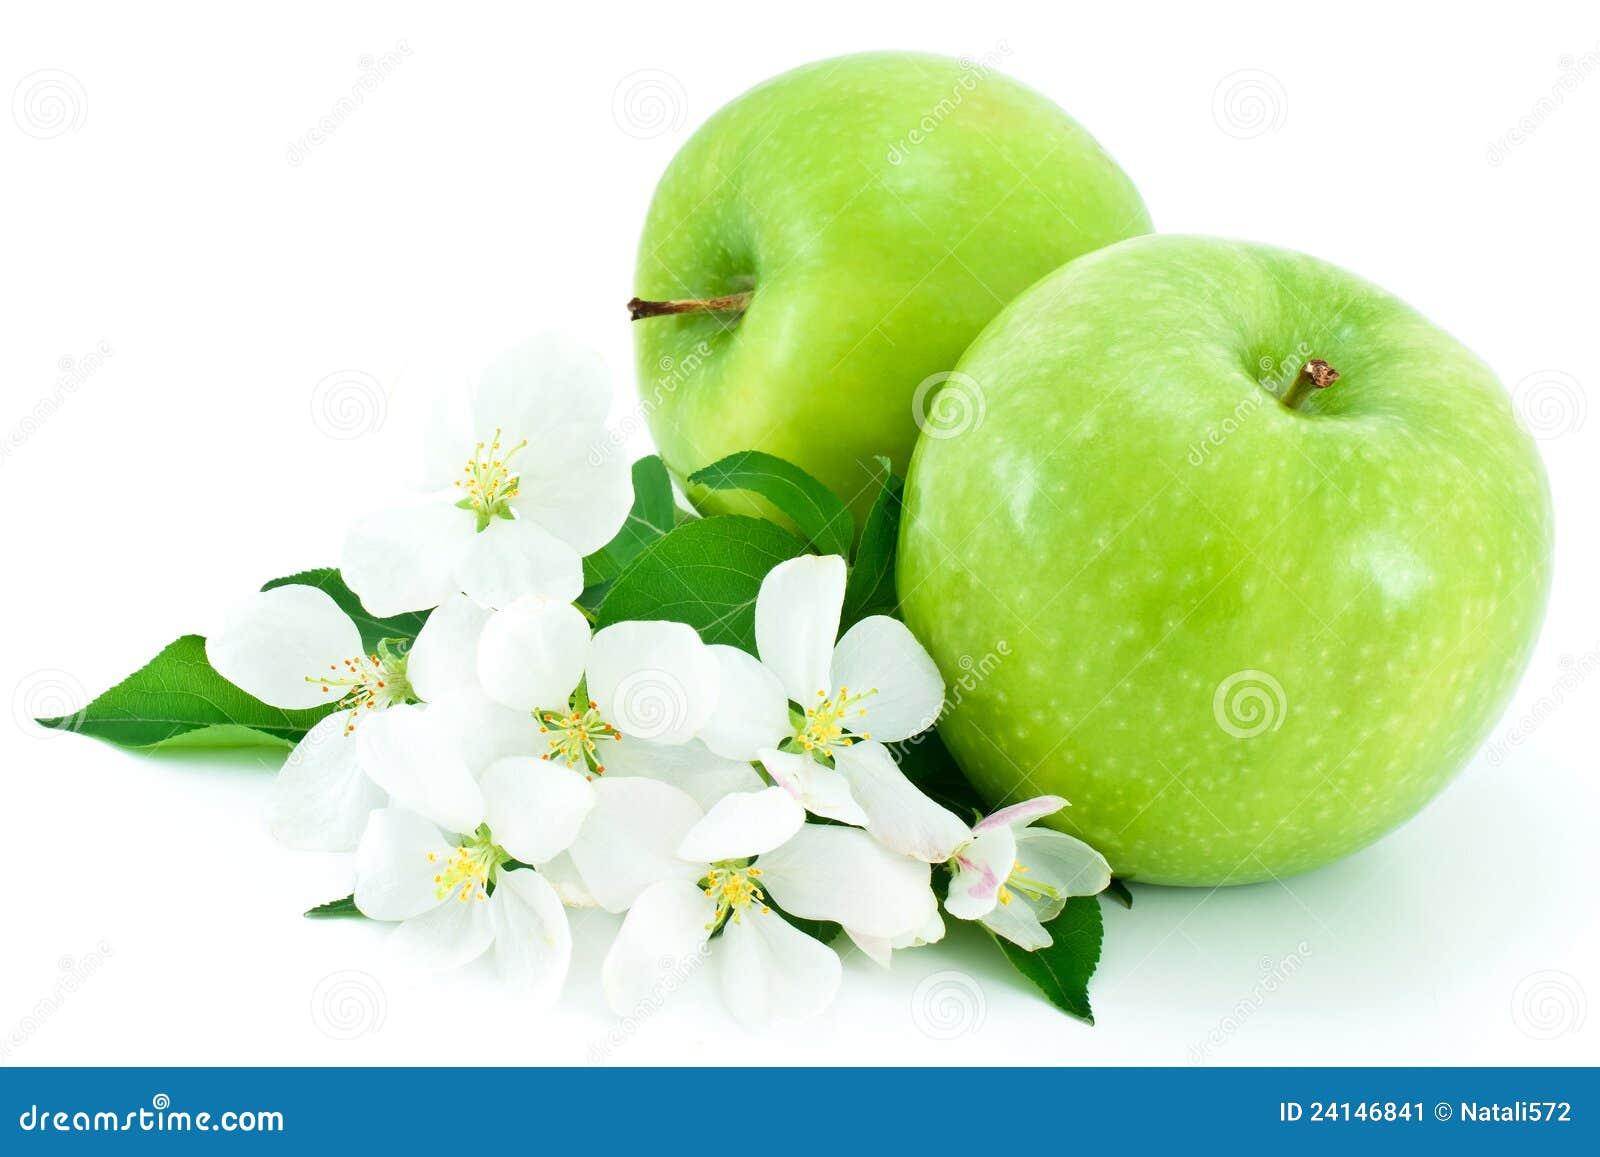 Due maturi fiori bianchi verdi e del mela immagine stock for Fiori verdi